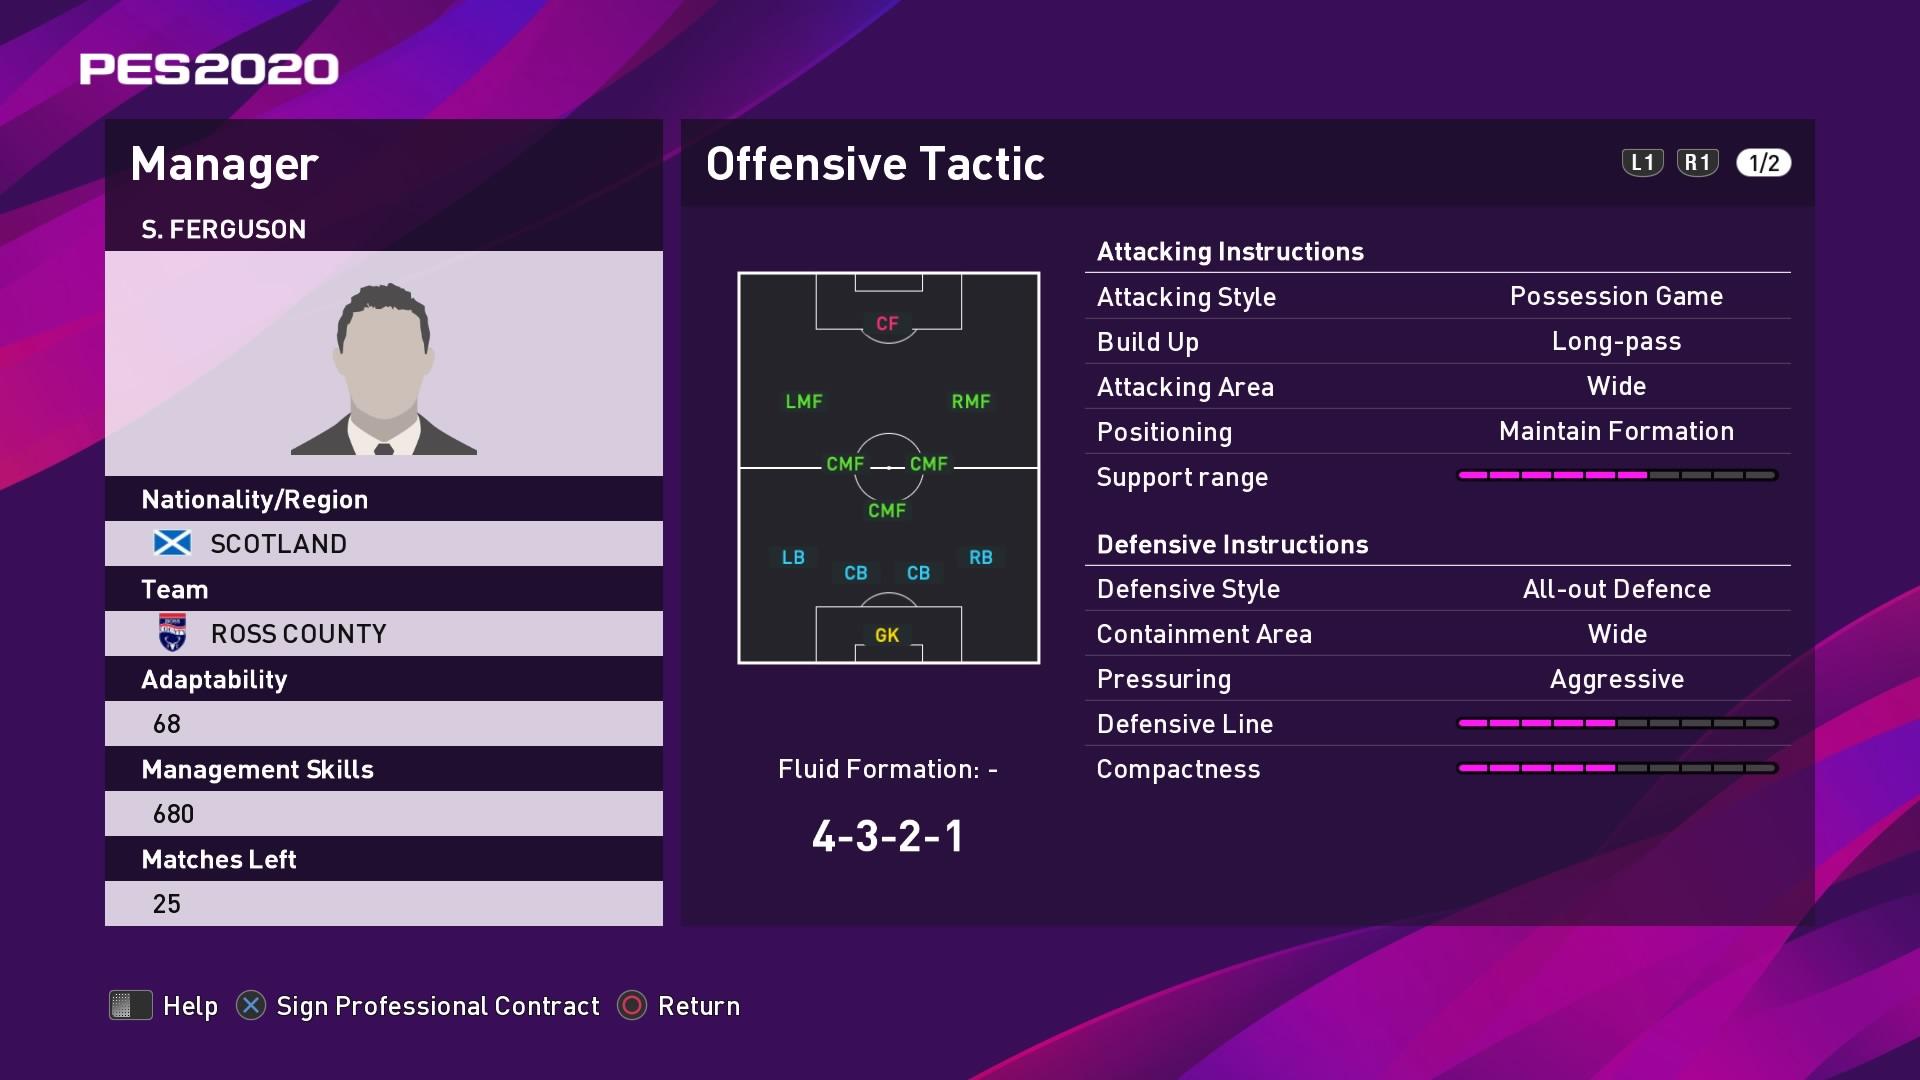 S. Ferguson (Steven Ferguson) Offensive Tactic in PES 2020 myClub